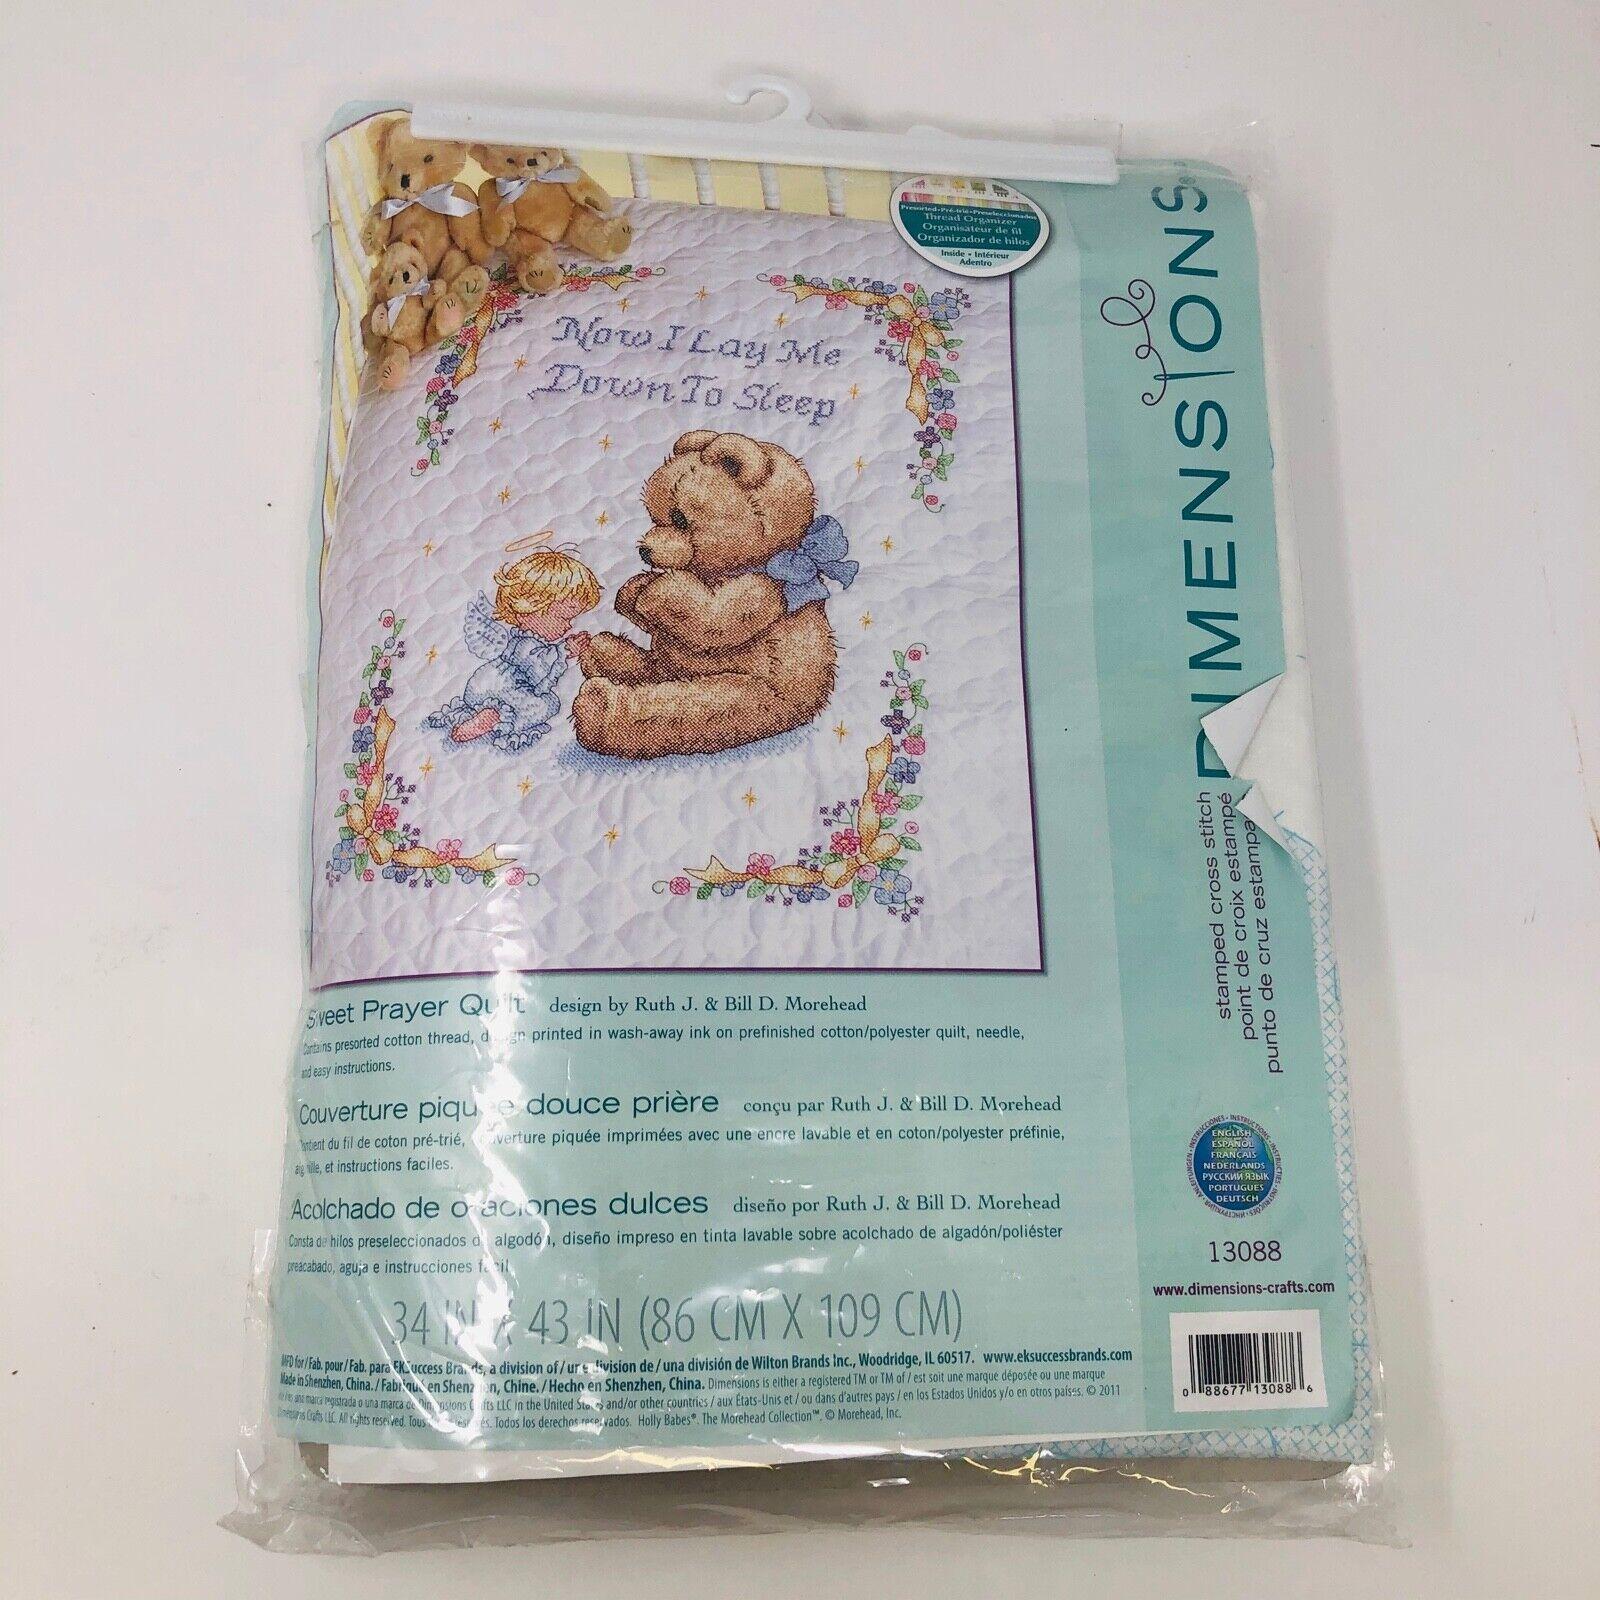 Sweet Prayer Quilt Stamped Cross Stitch Kit